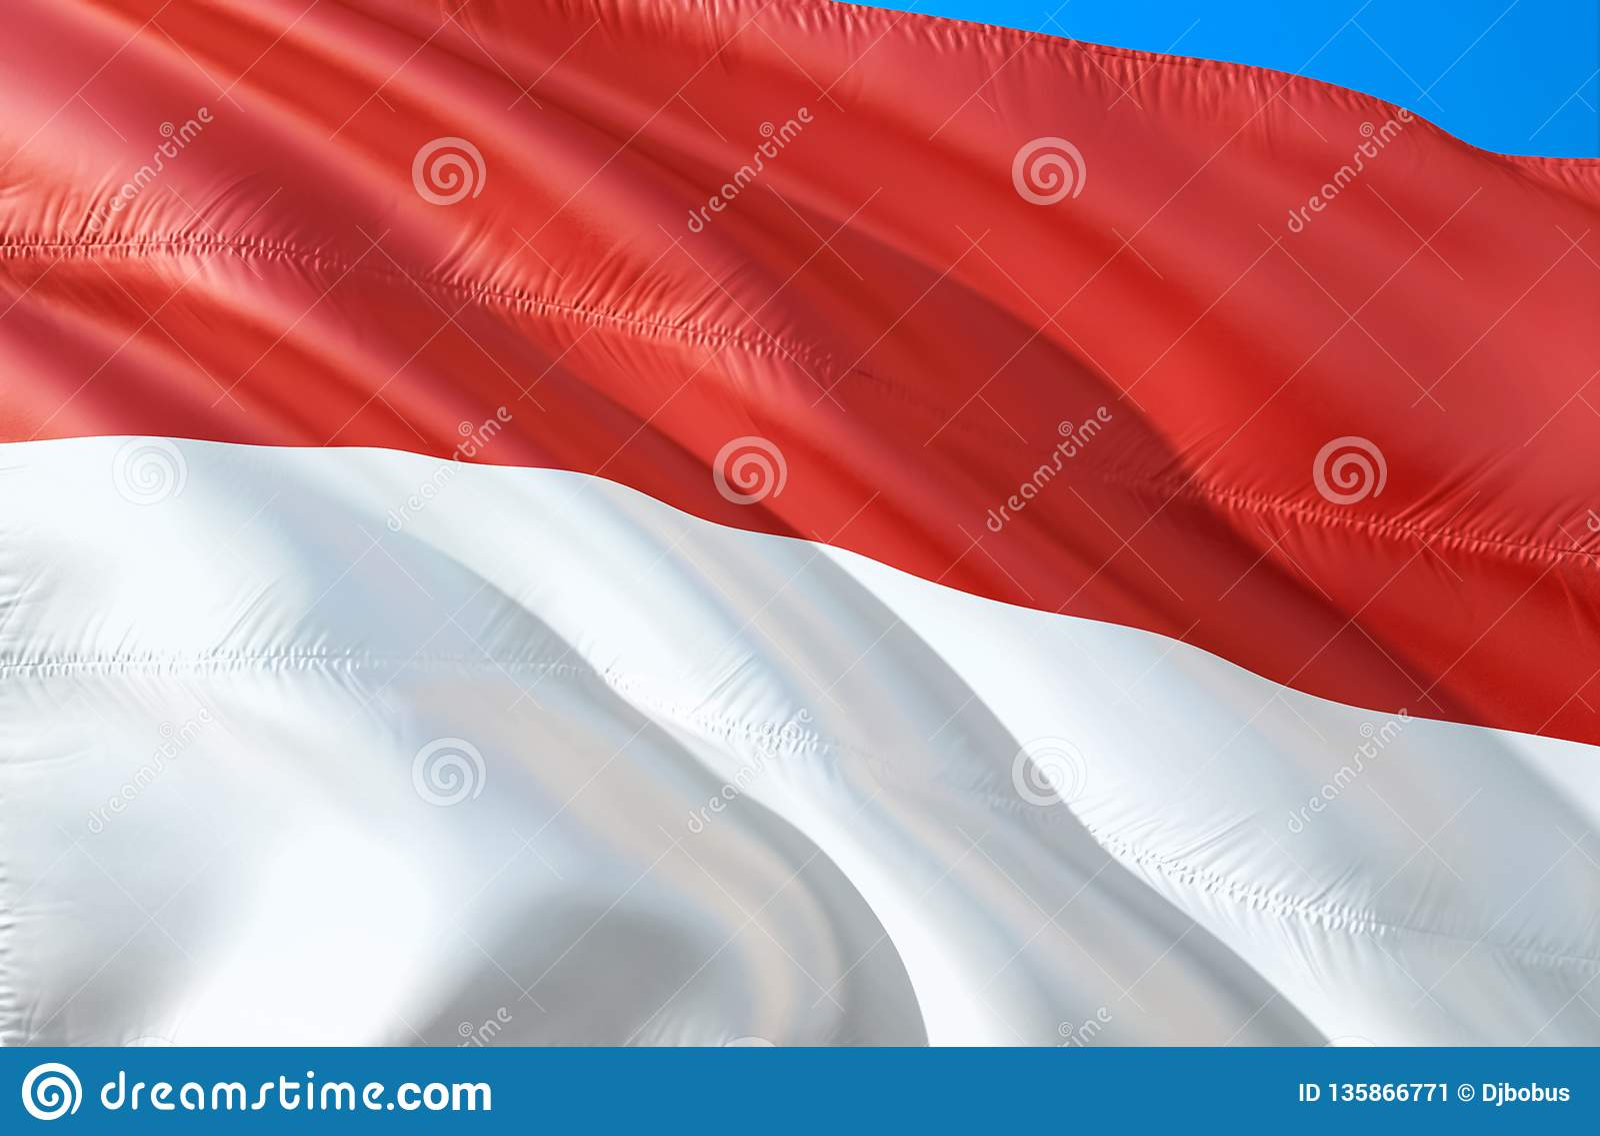 Unduh 900 Wallpaper 3d Indonesia HD Gratis